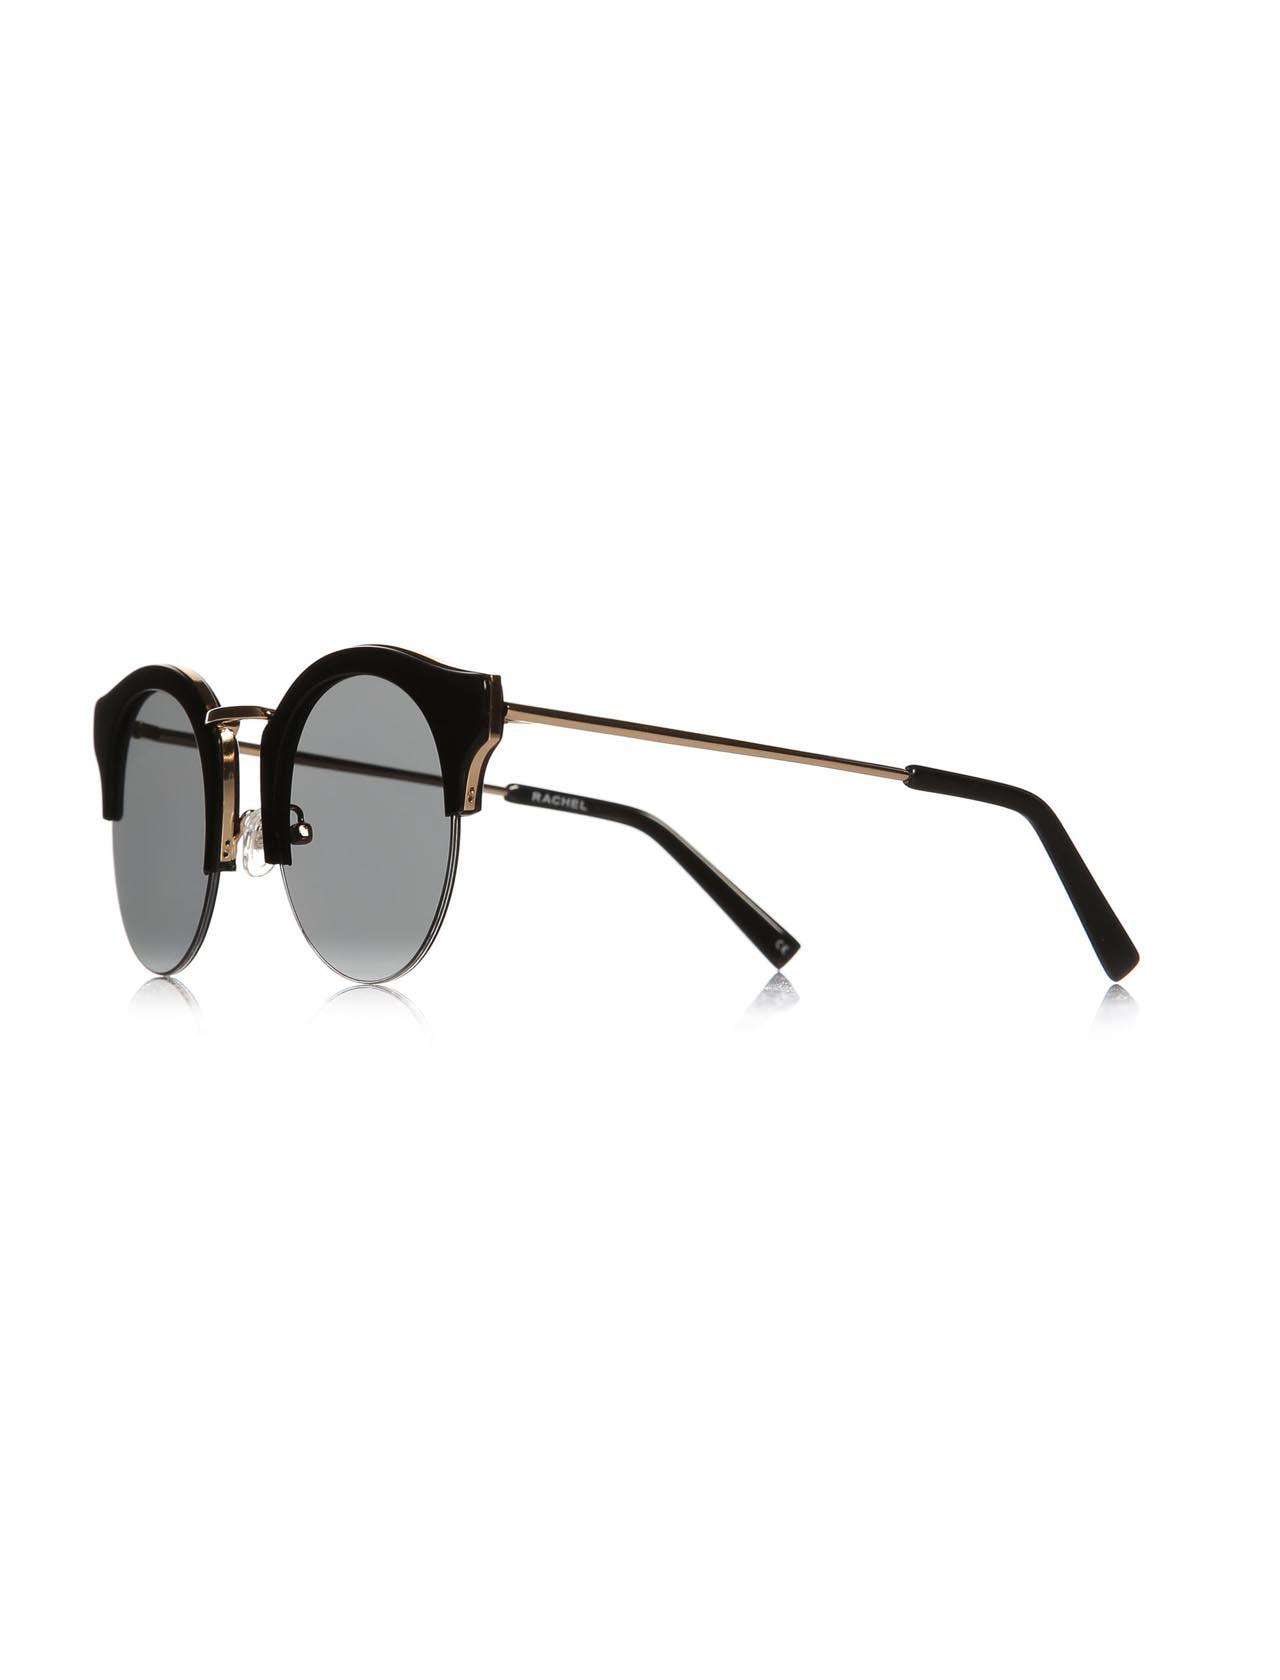 Women's sunglasses rh 15798 02 bone black organic oval aval 50-22-150 rachel